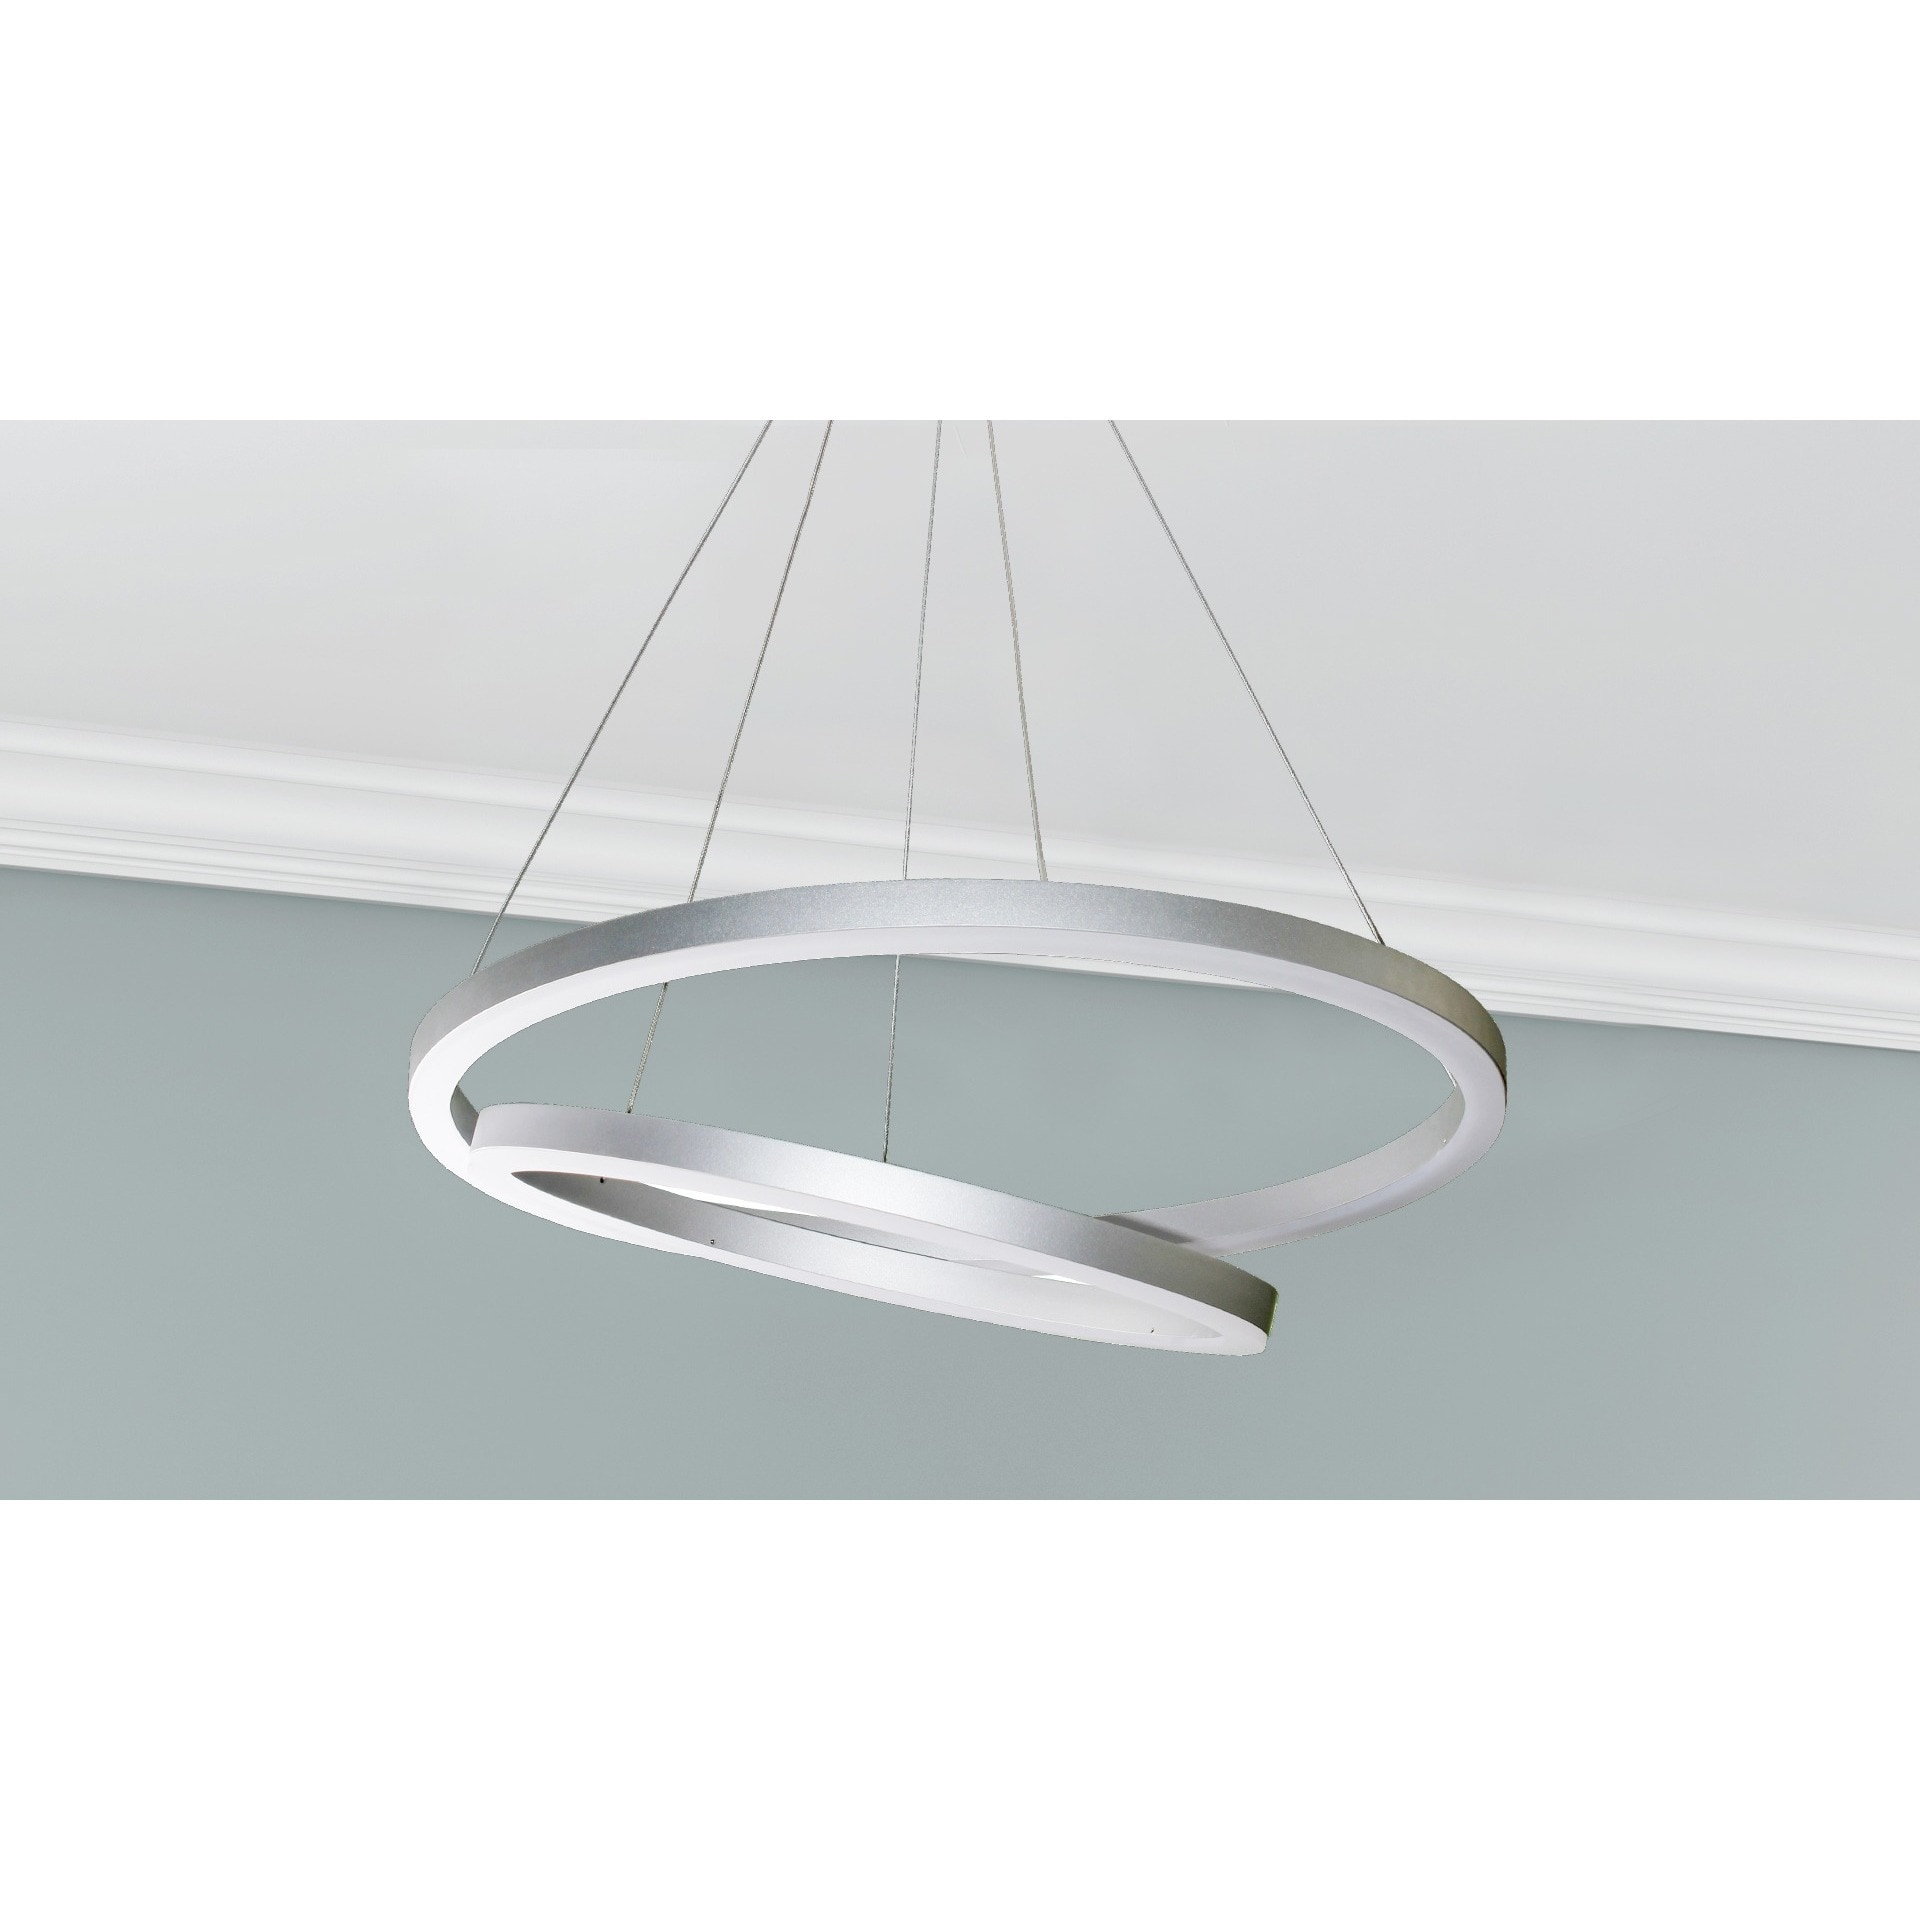 VONN Lighting VMC AL Tania Duo 24 inch LED Modern Circular